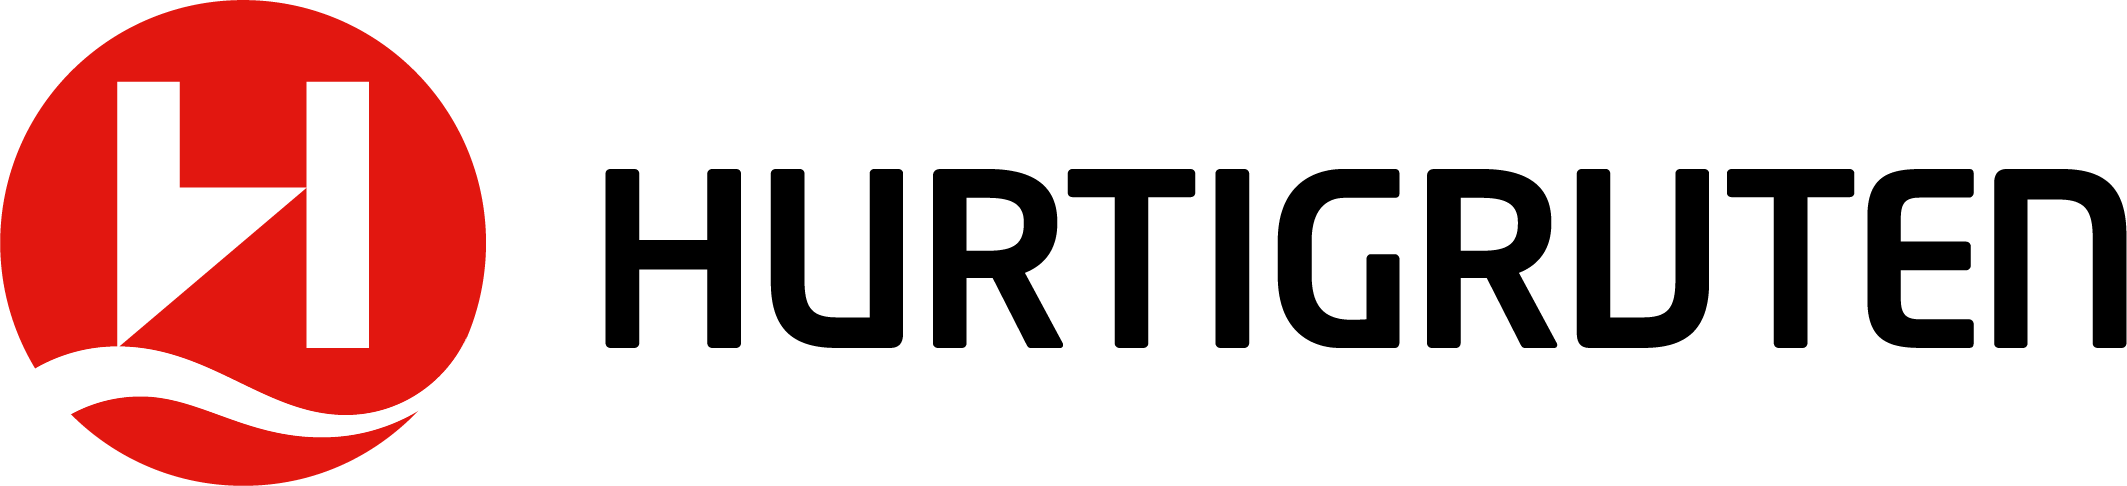 Hurtigruten_logo_primary_RGB_red-positive.png